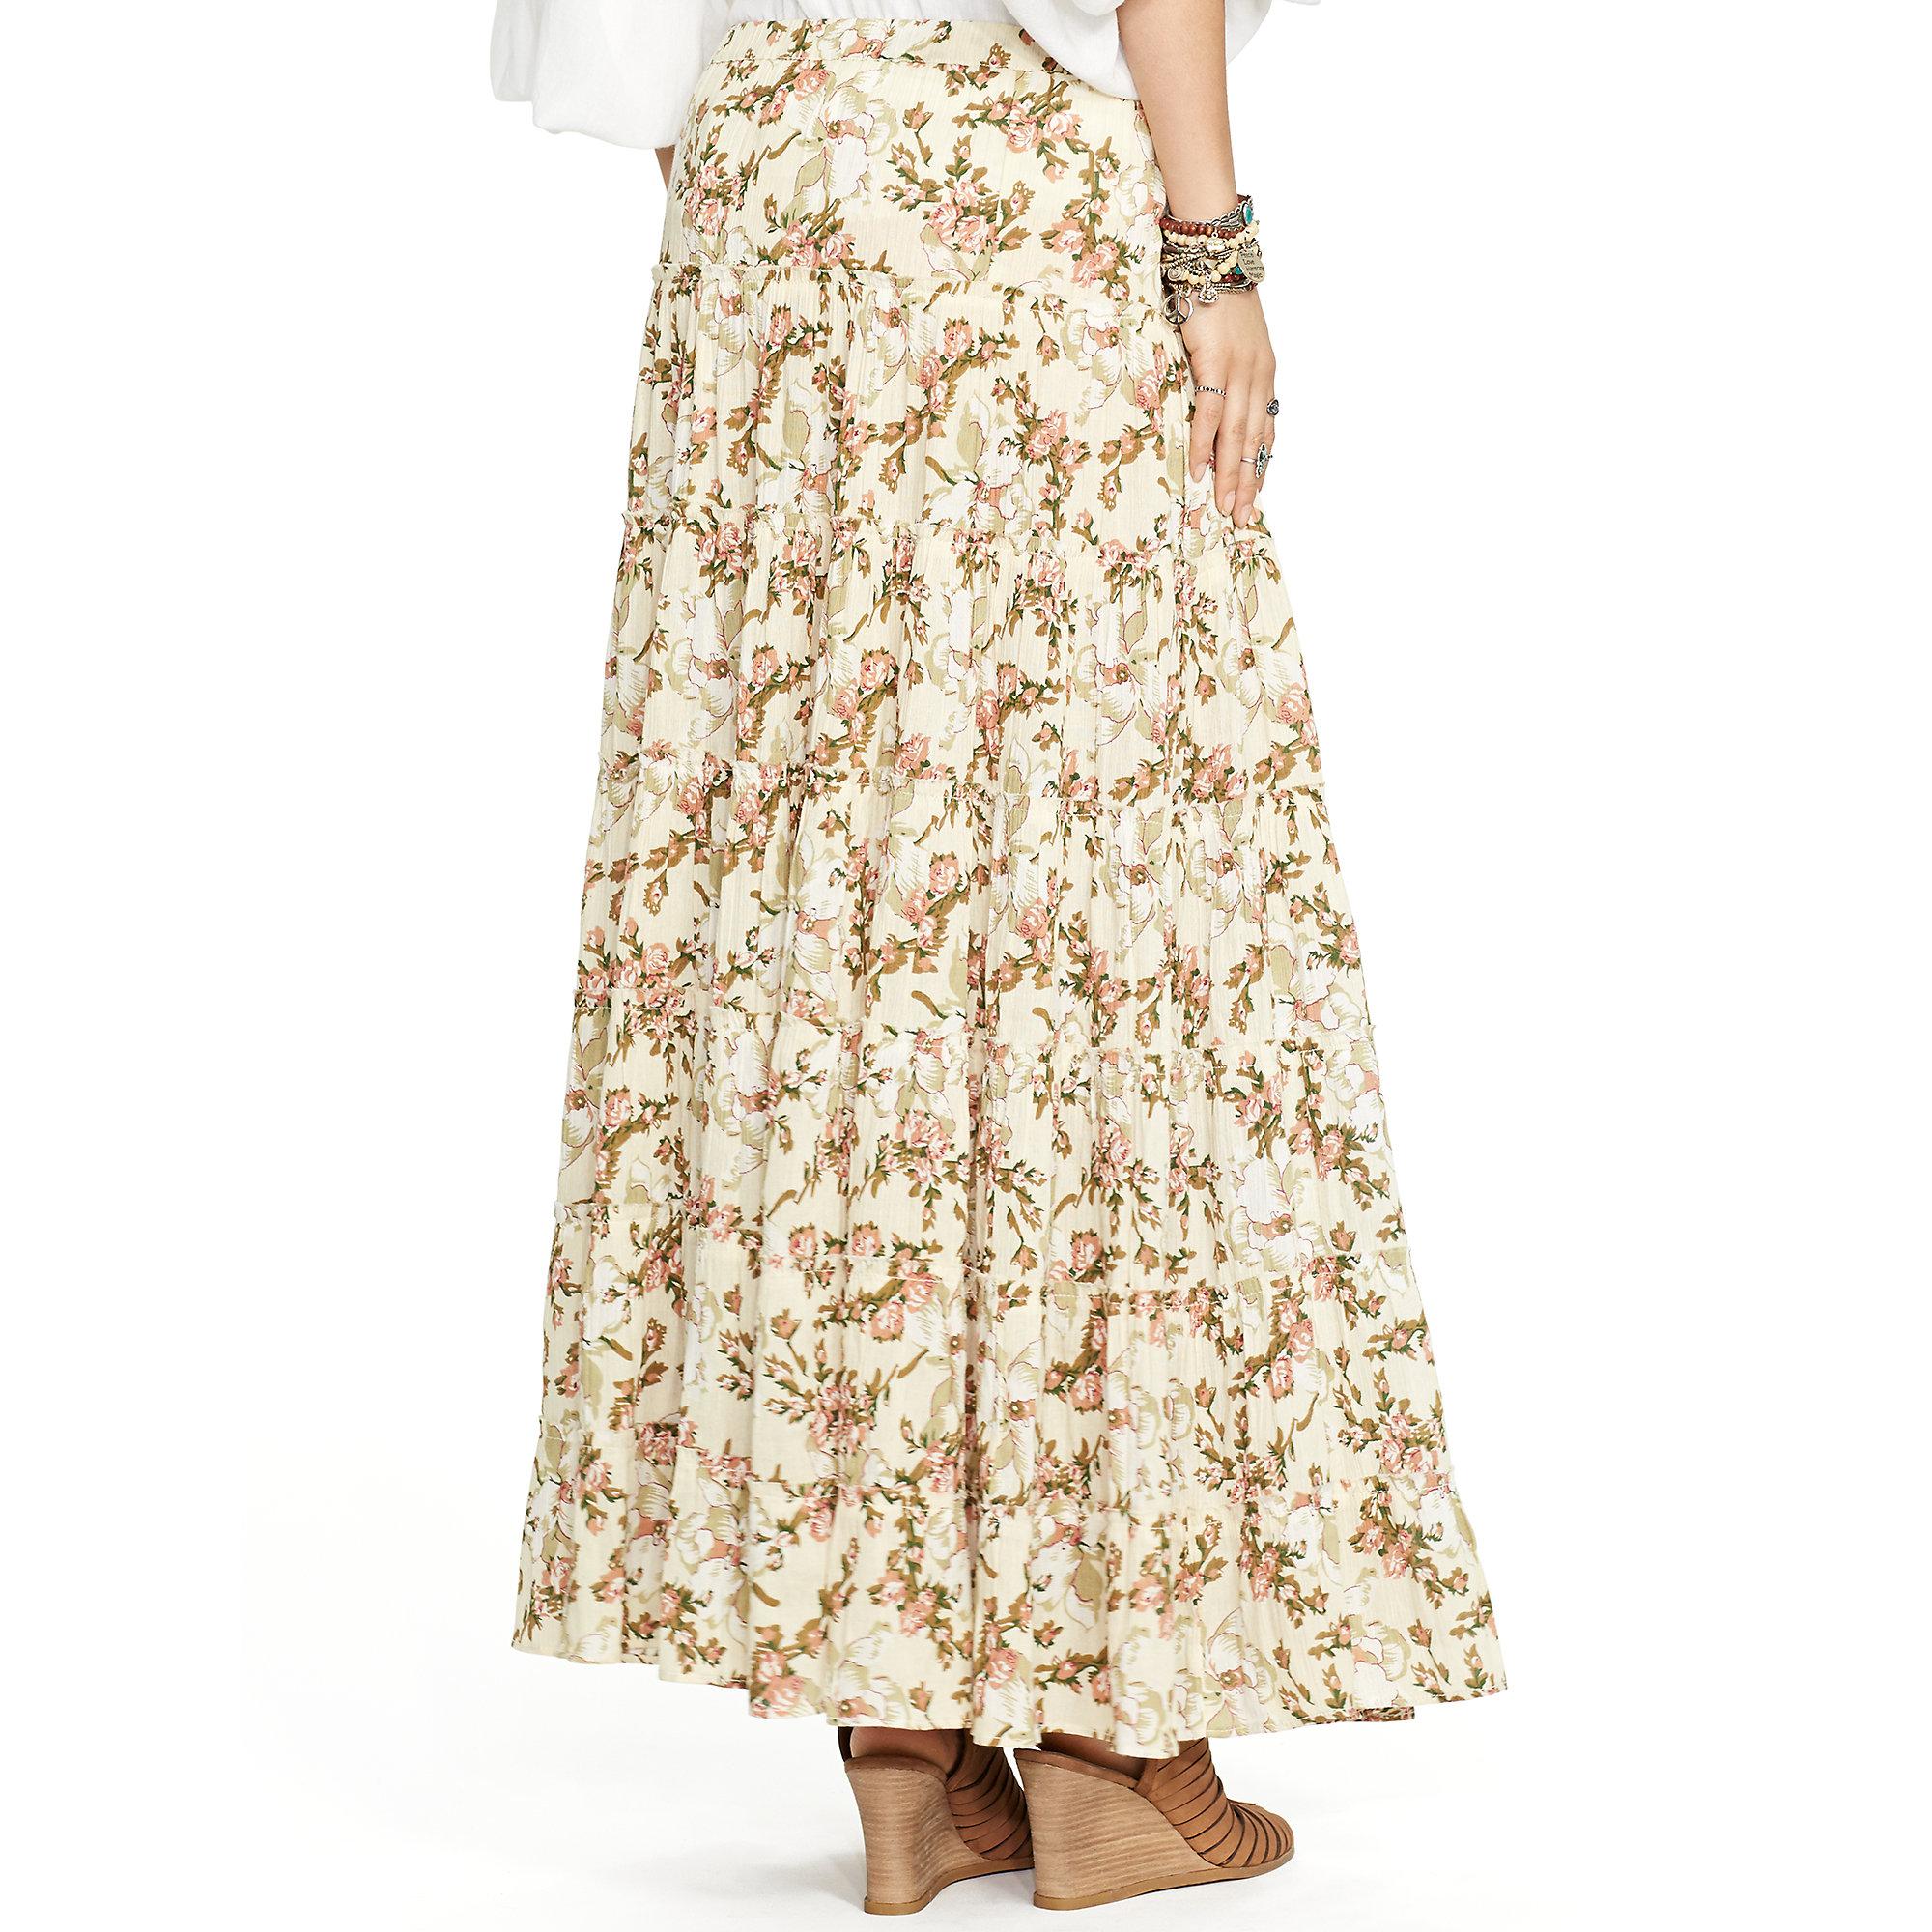 adfa3cbc71 Ralph Lauren Denim And Supply Maxi Skirt